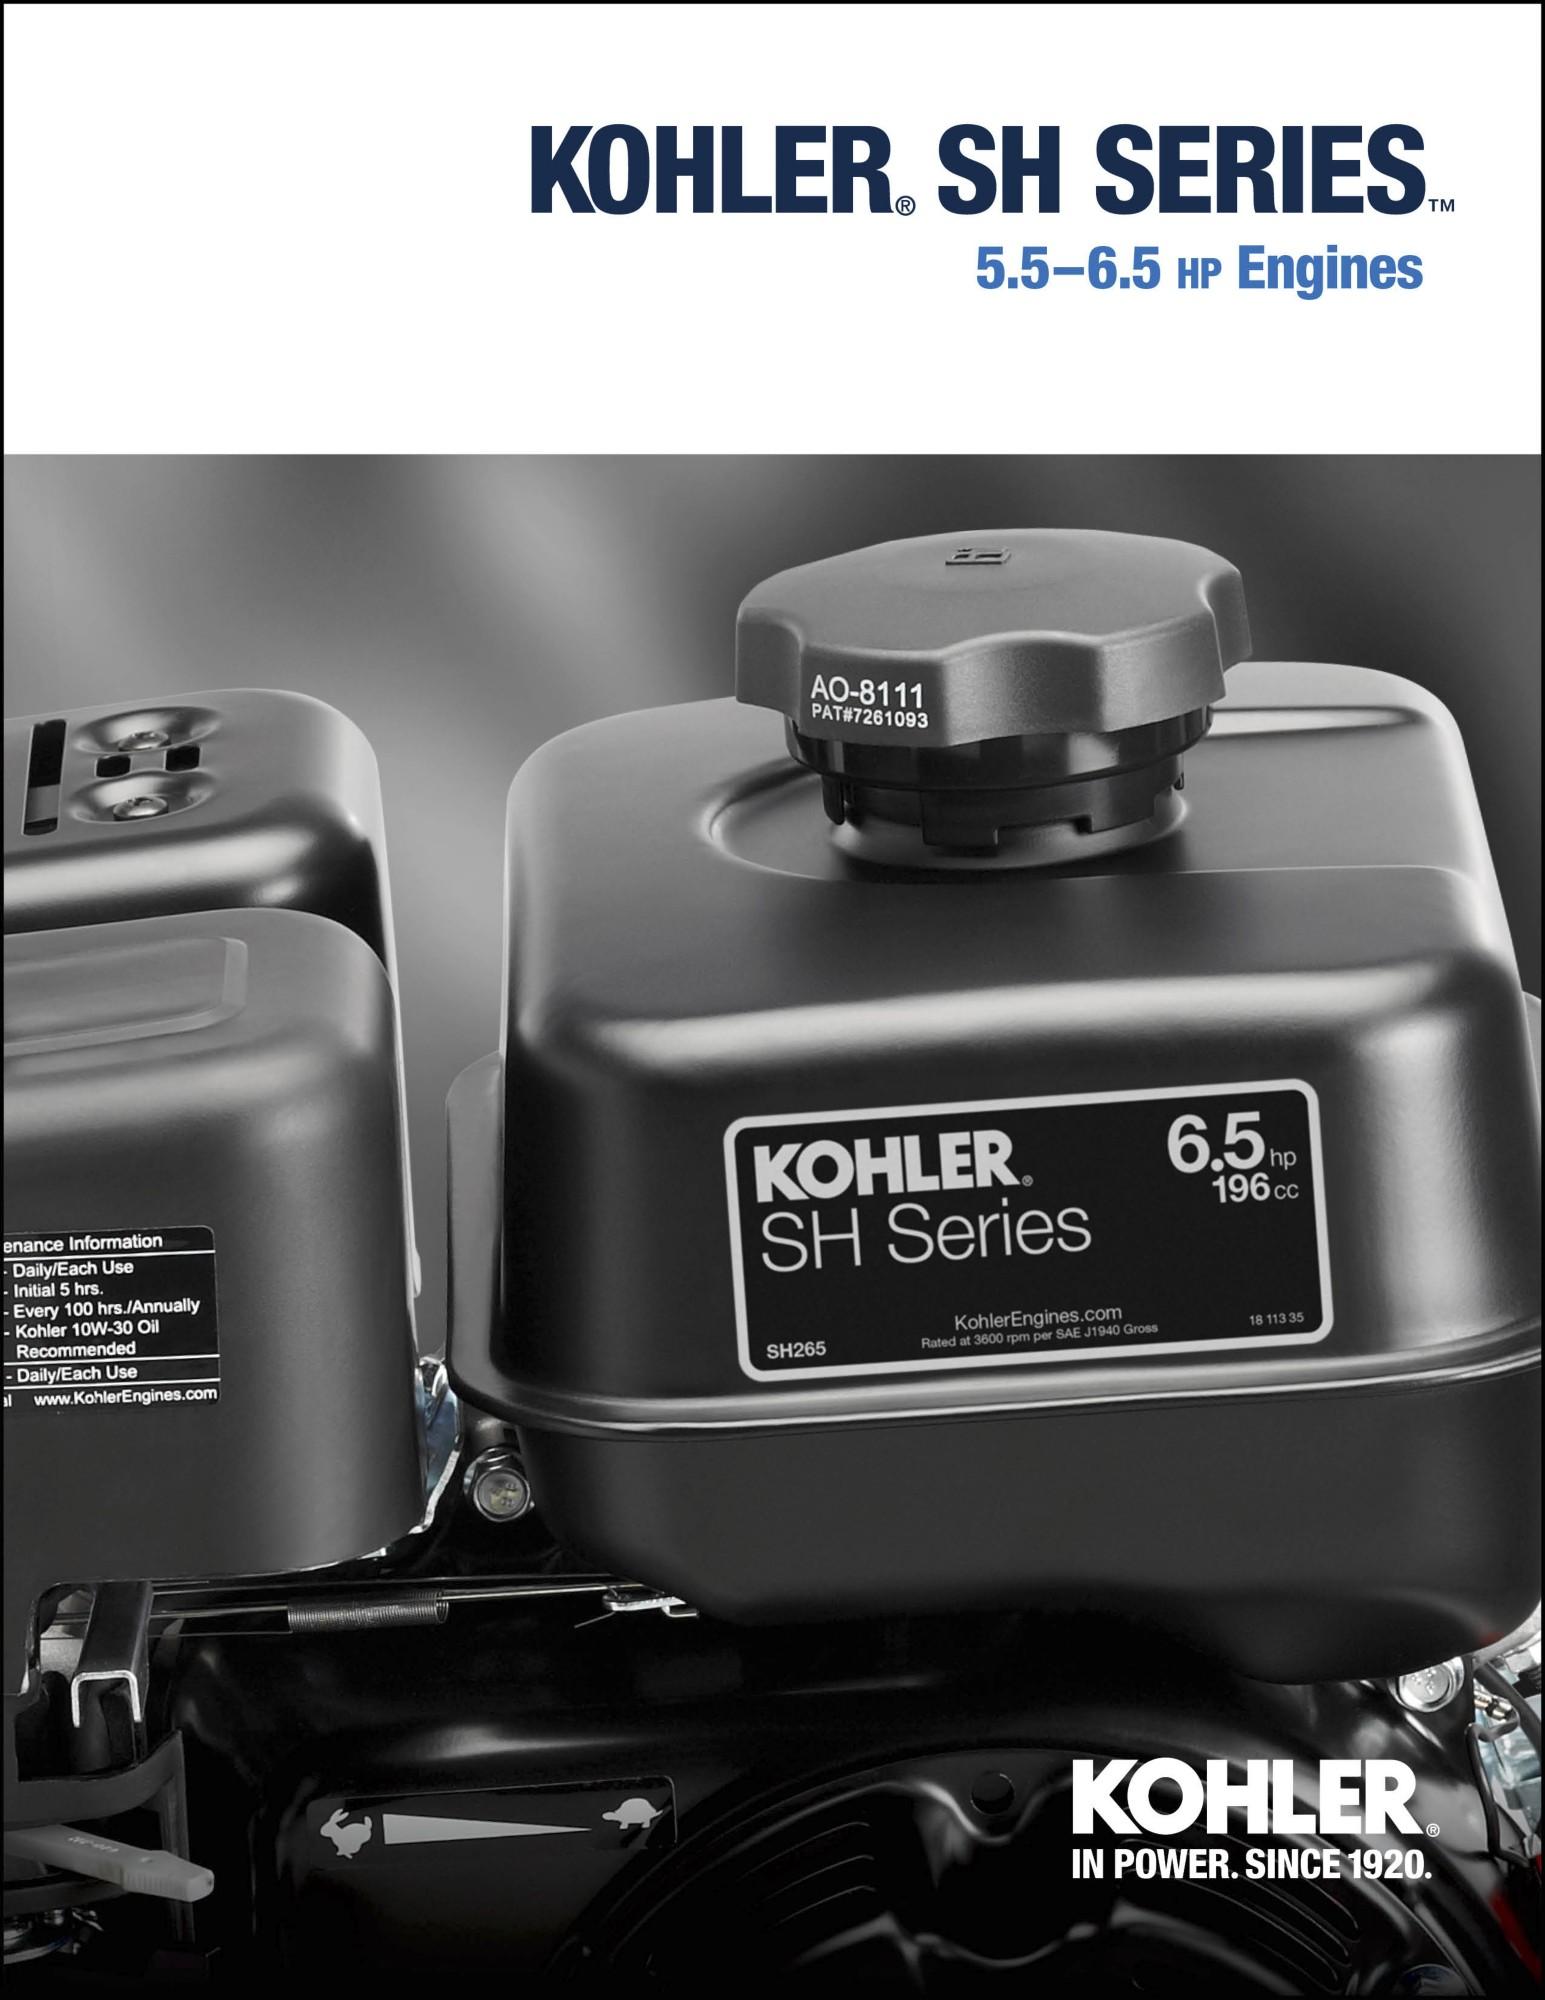 Literature and Brochures | Kohler Engines